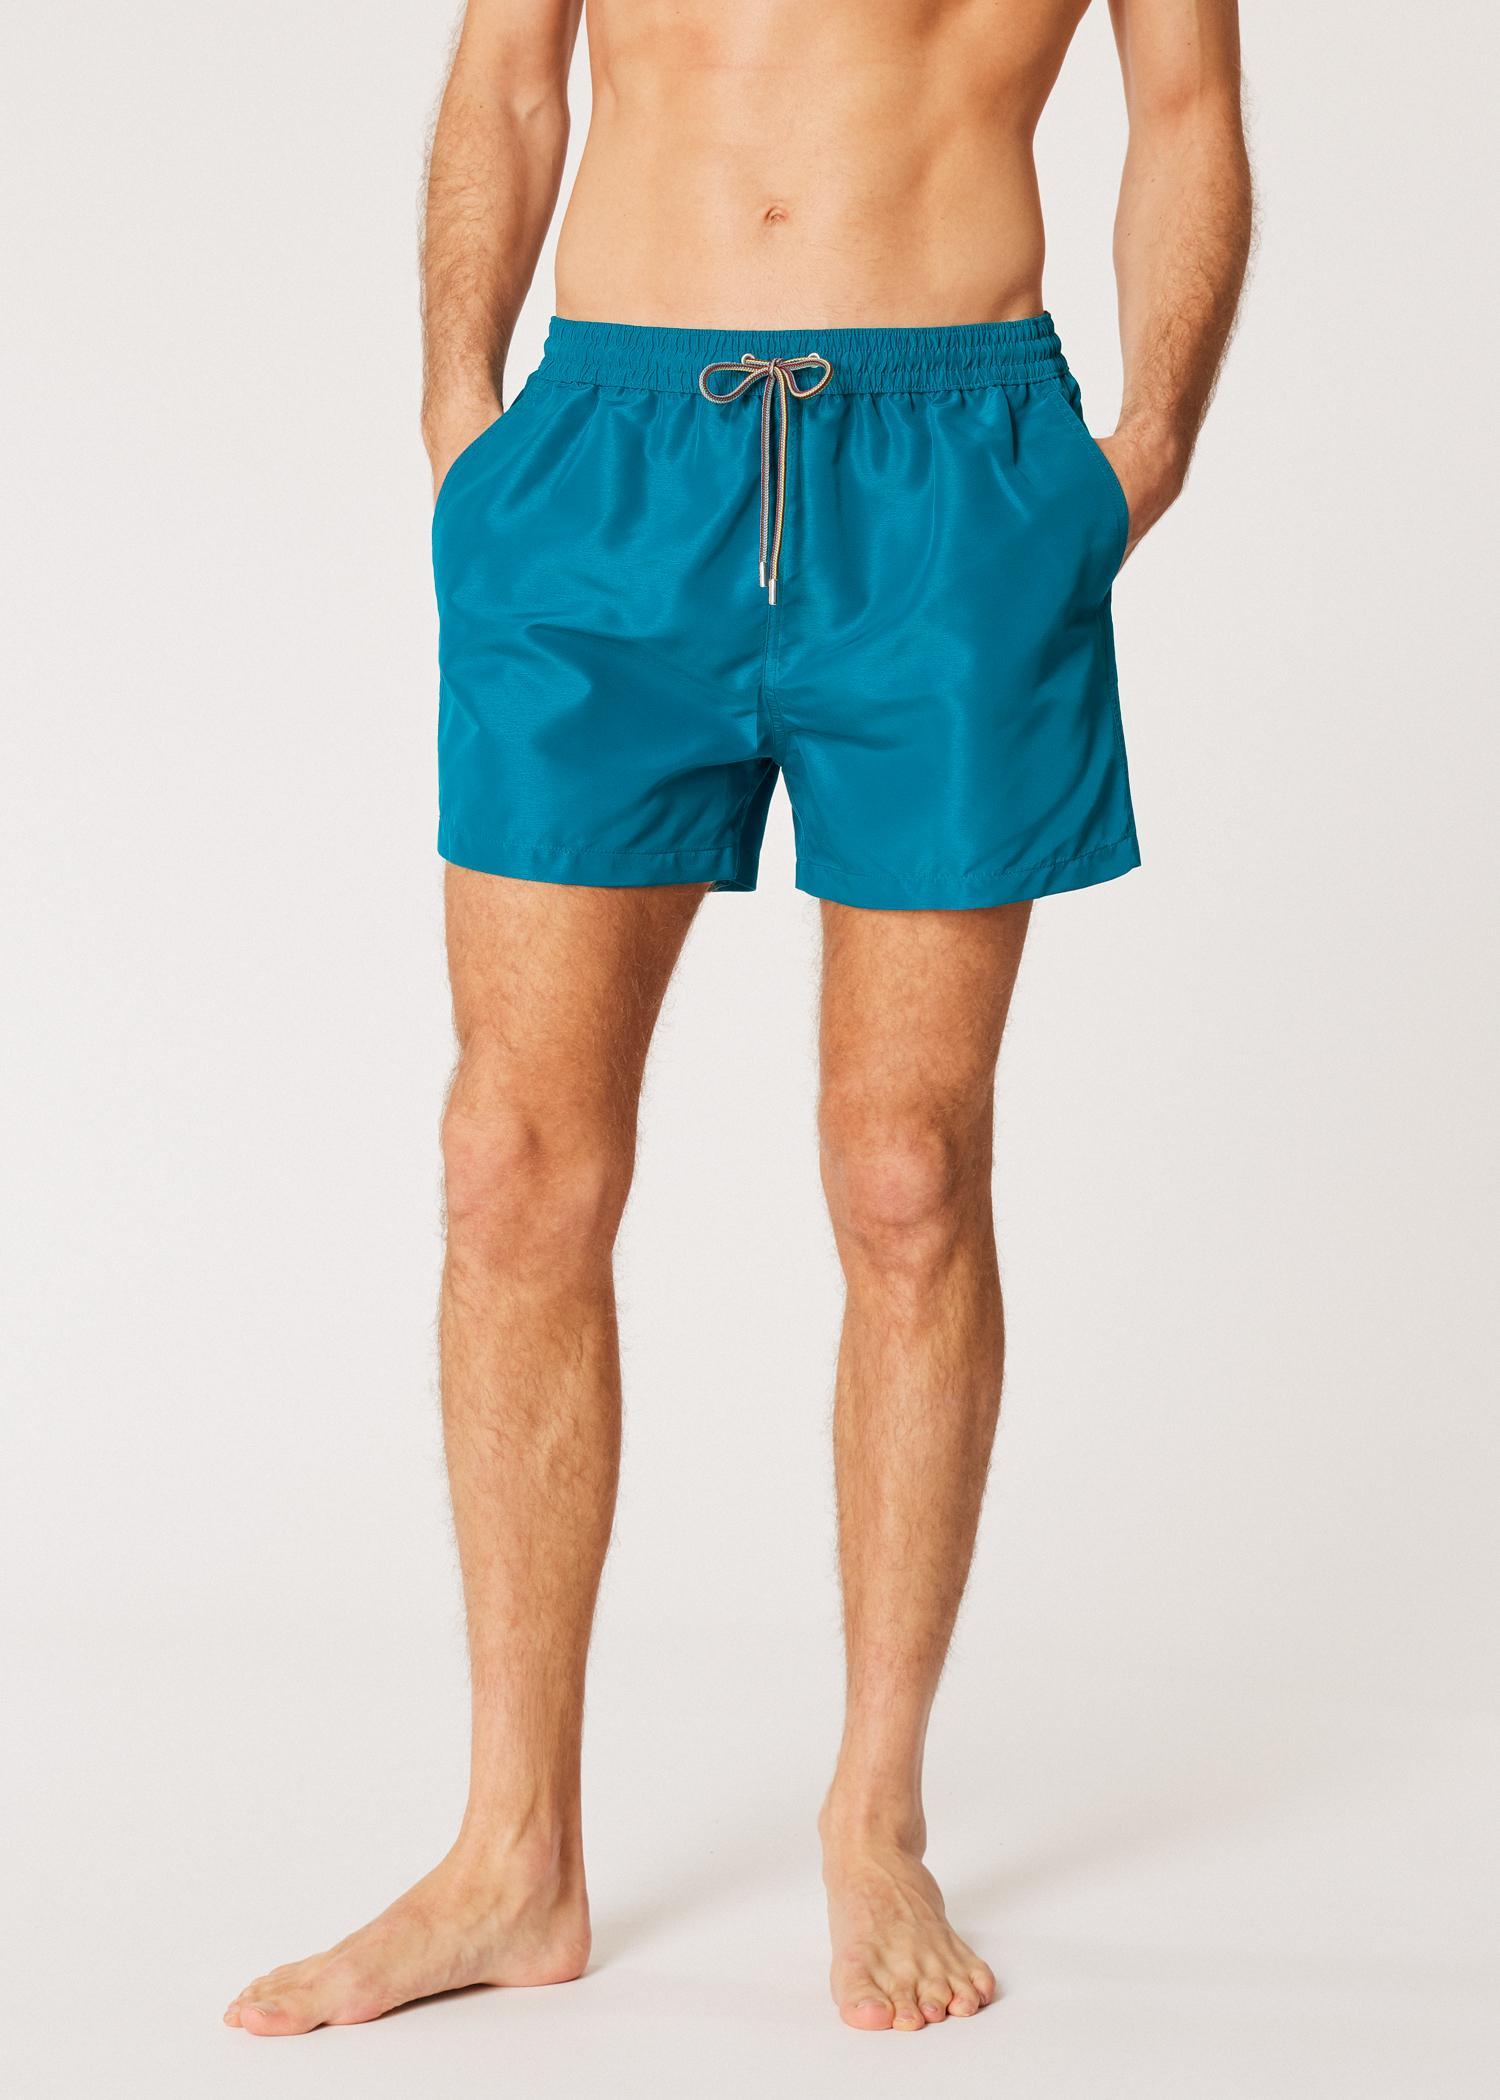 47a3d80ba Paul Smith Petrol Blue Swim Shorts in Blue for Men - Lyst